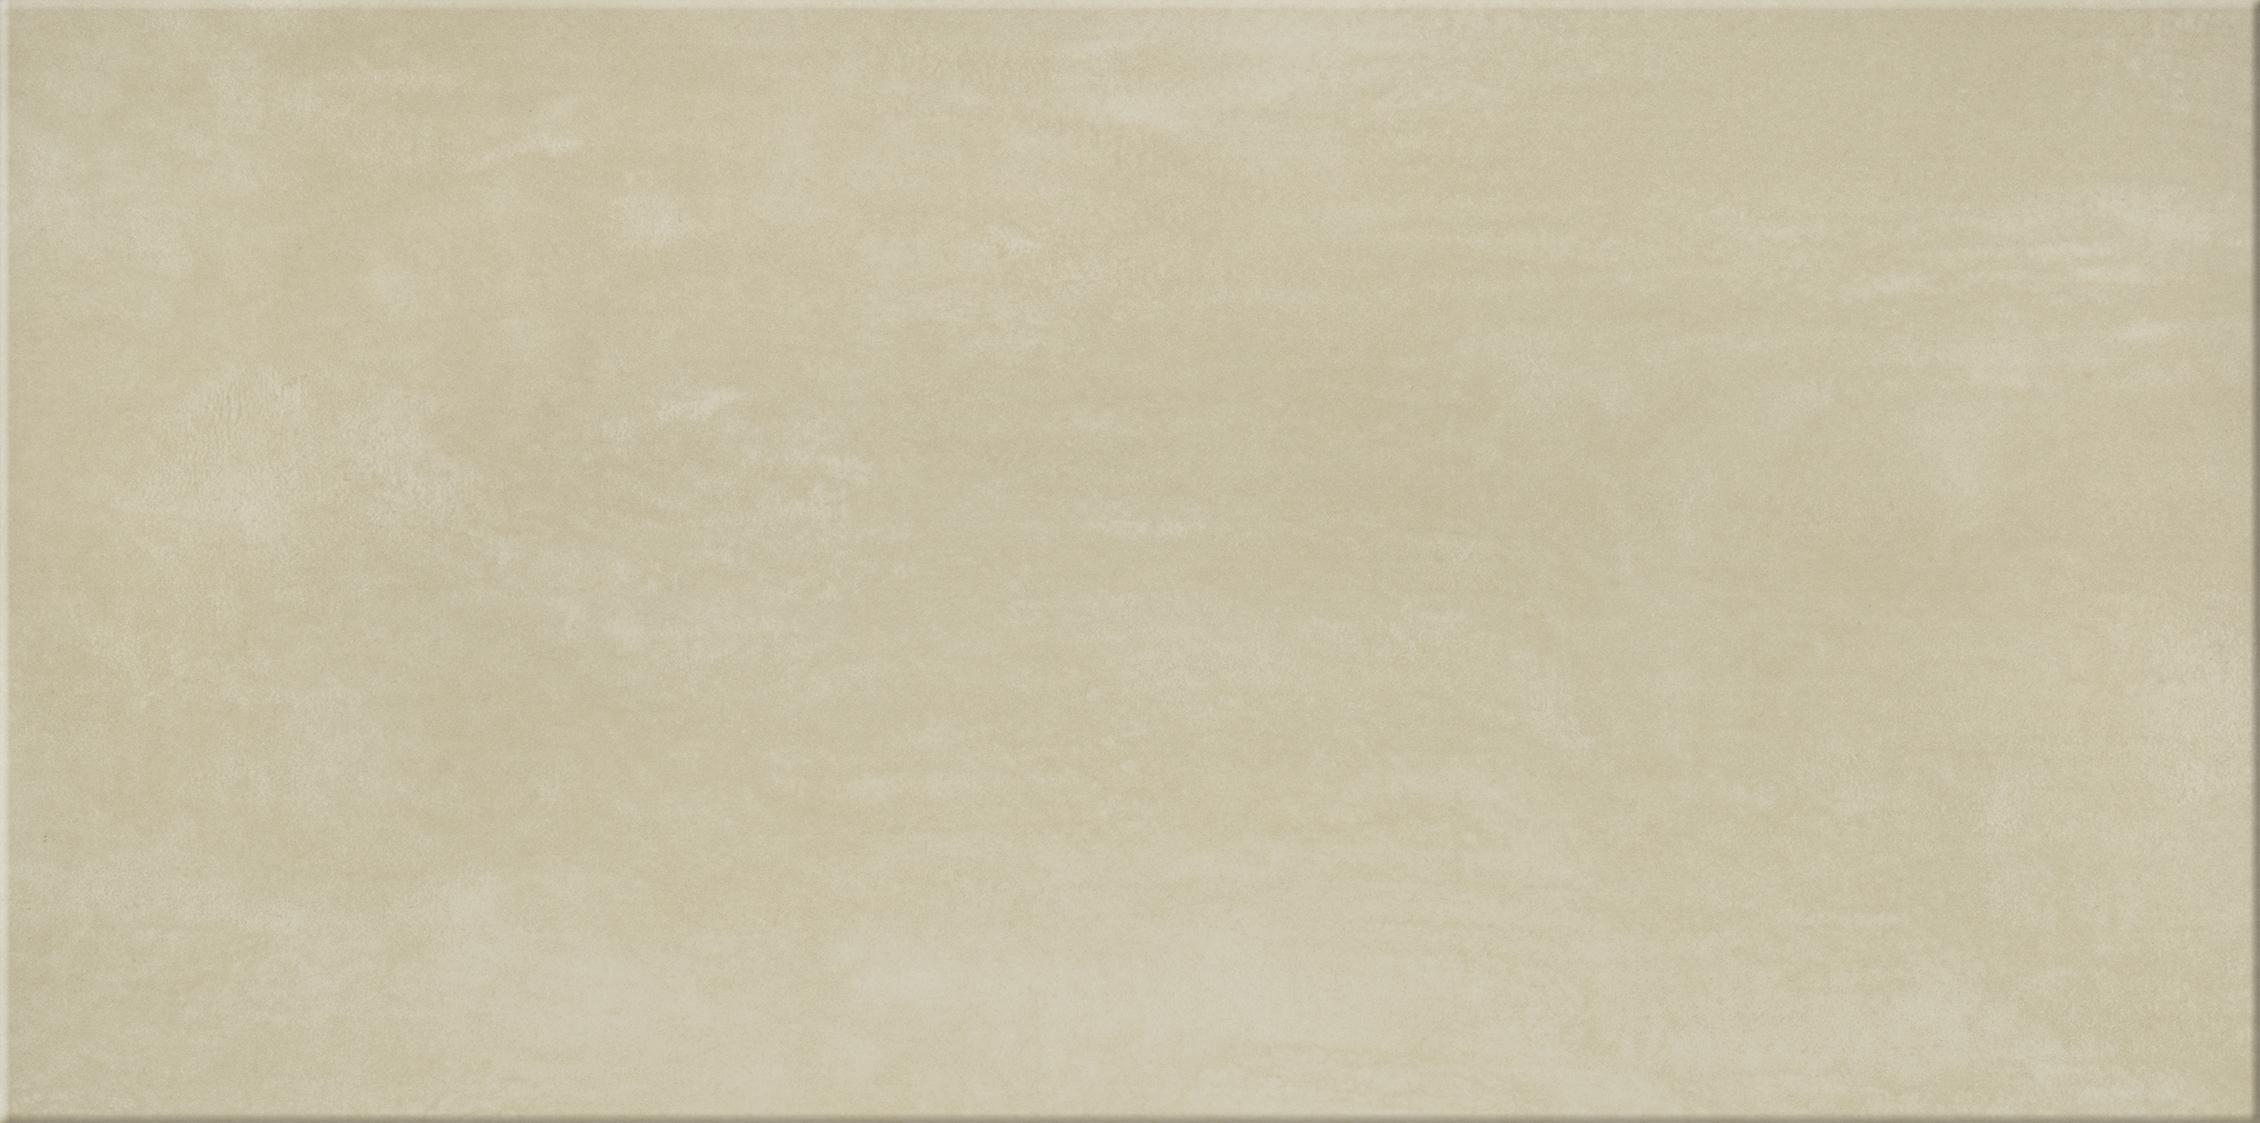 Fliesen Betonoptik Beige 30x60 Meissen Keramik Concrete Flower Bei  Fliesenprofi Kaufen | Fliesen Profi   Fliesen Online Kaufen